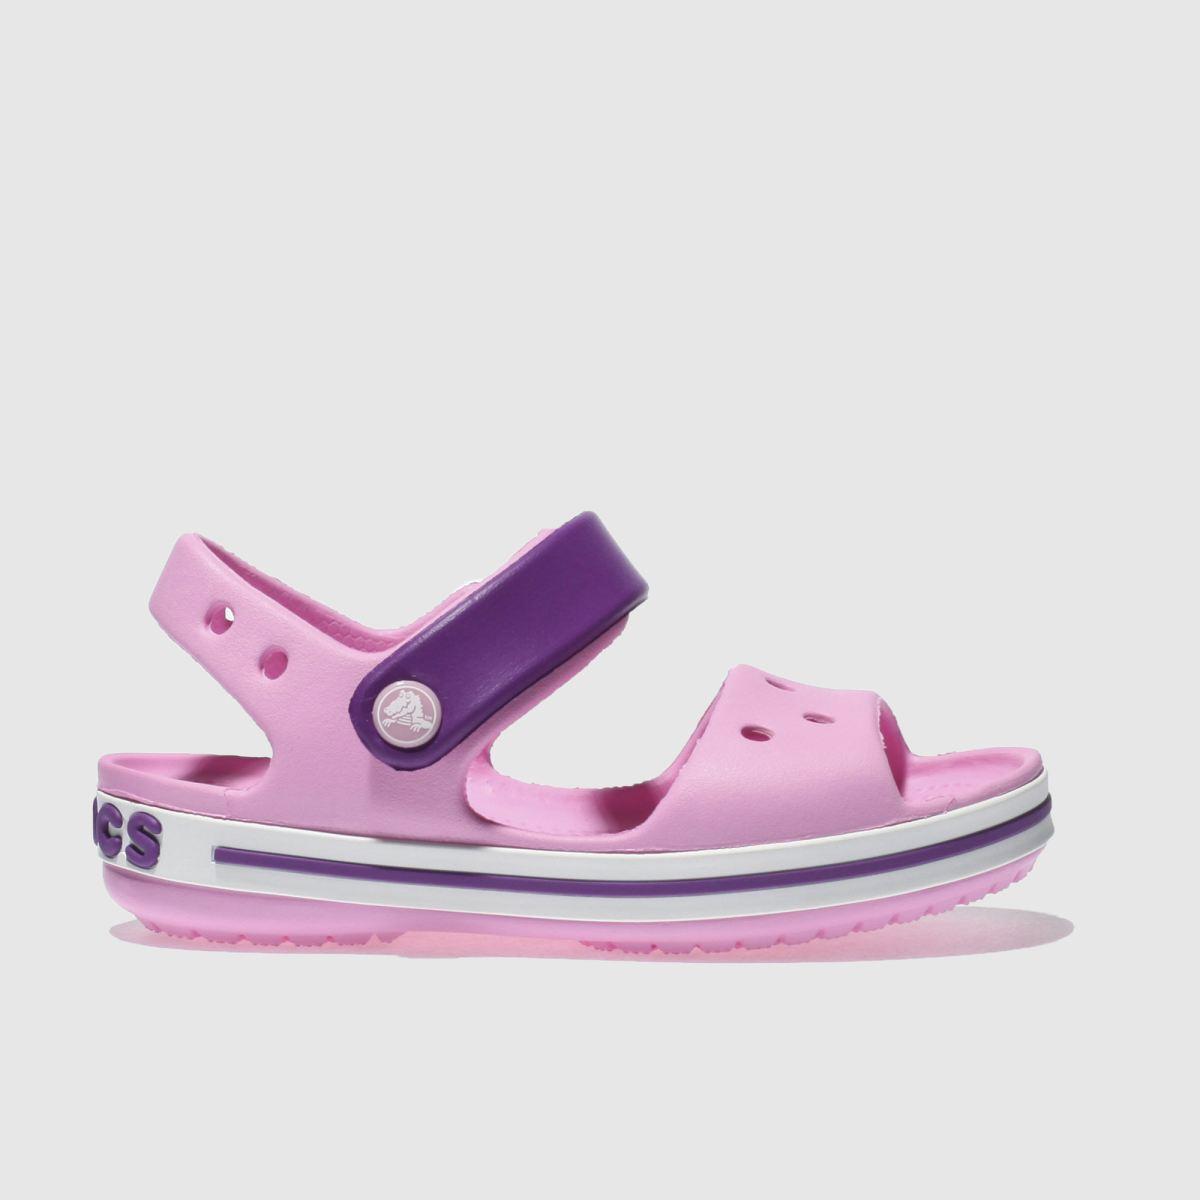 Crocs Crocs Pale Pink Crocband Sandal Sandals Toddler